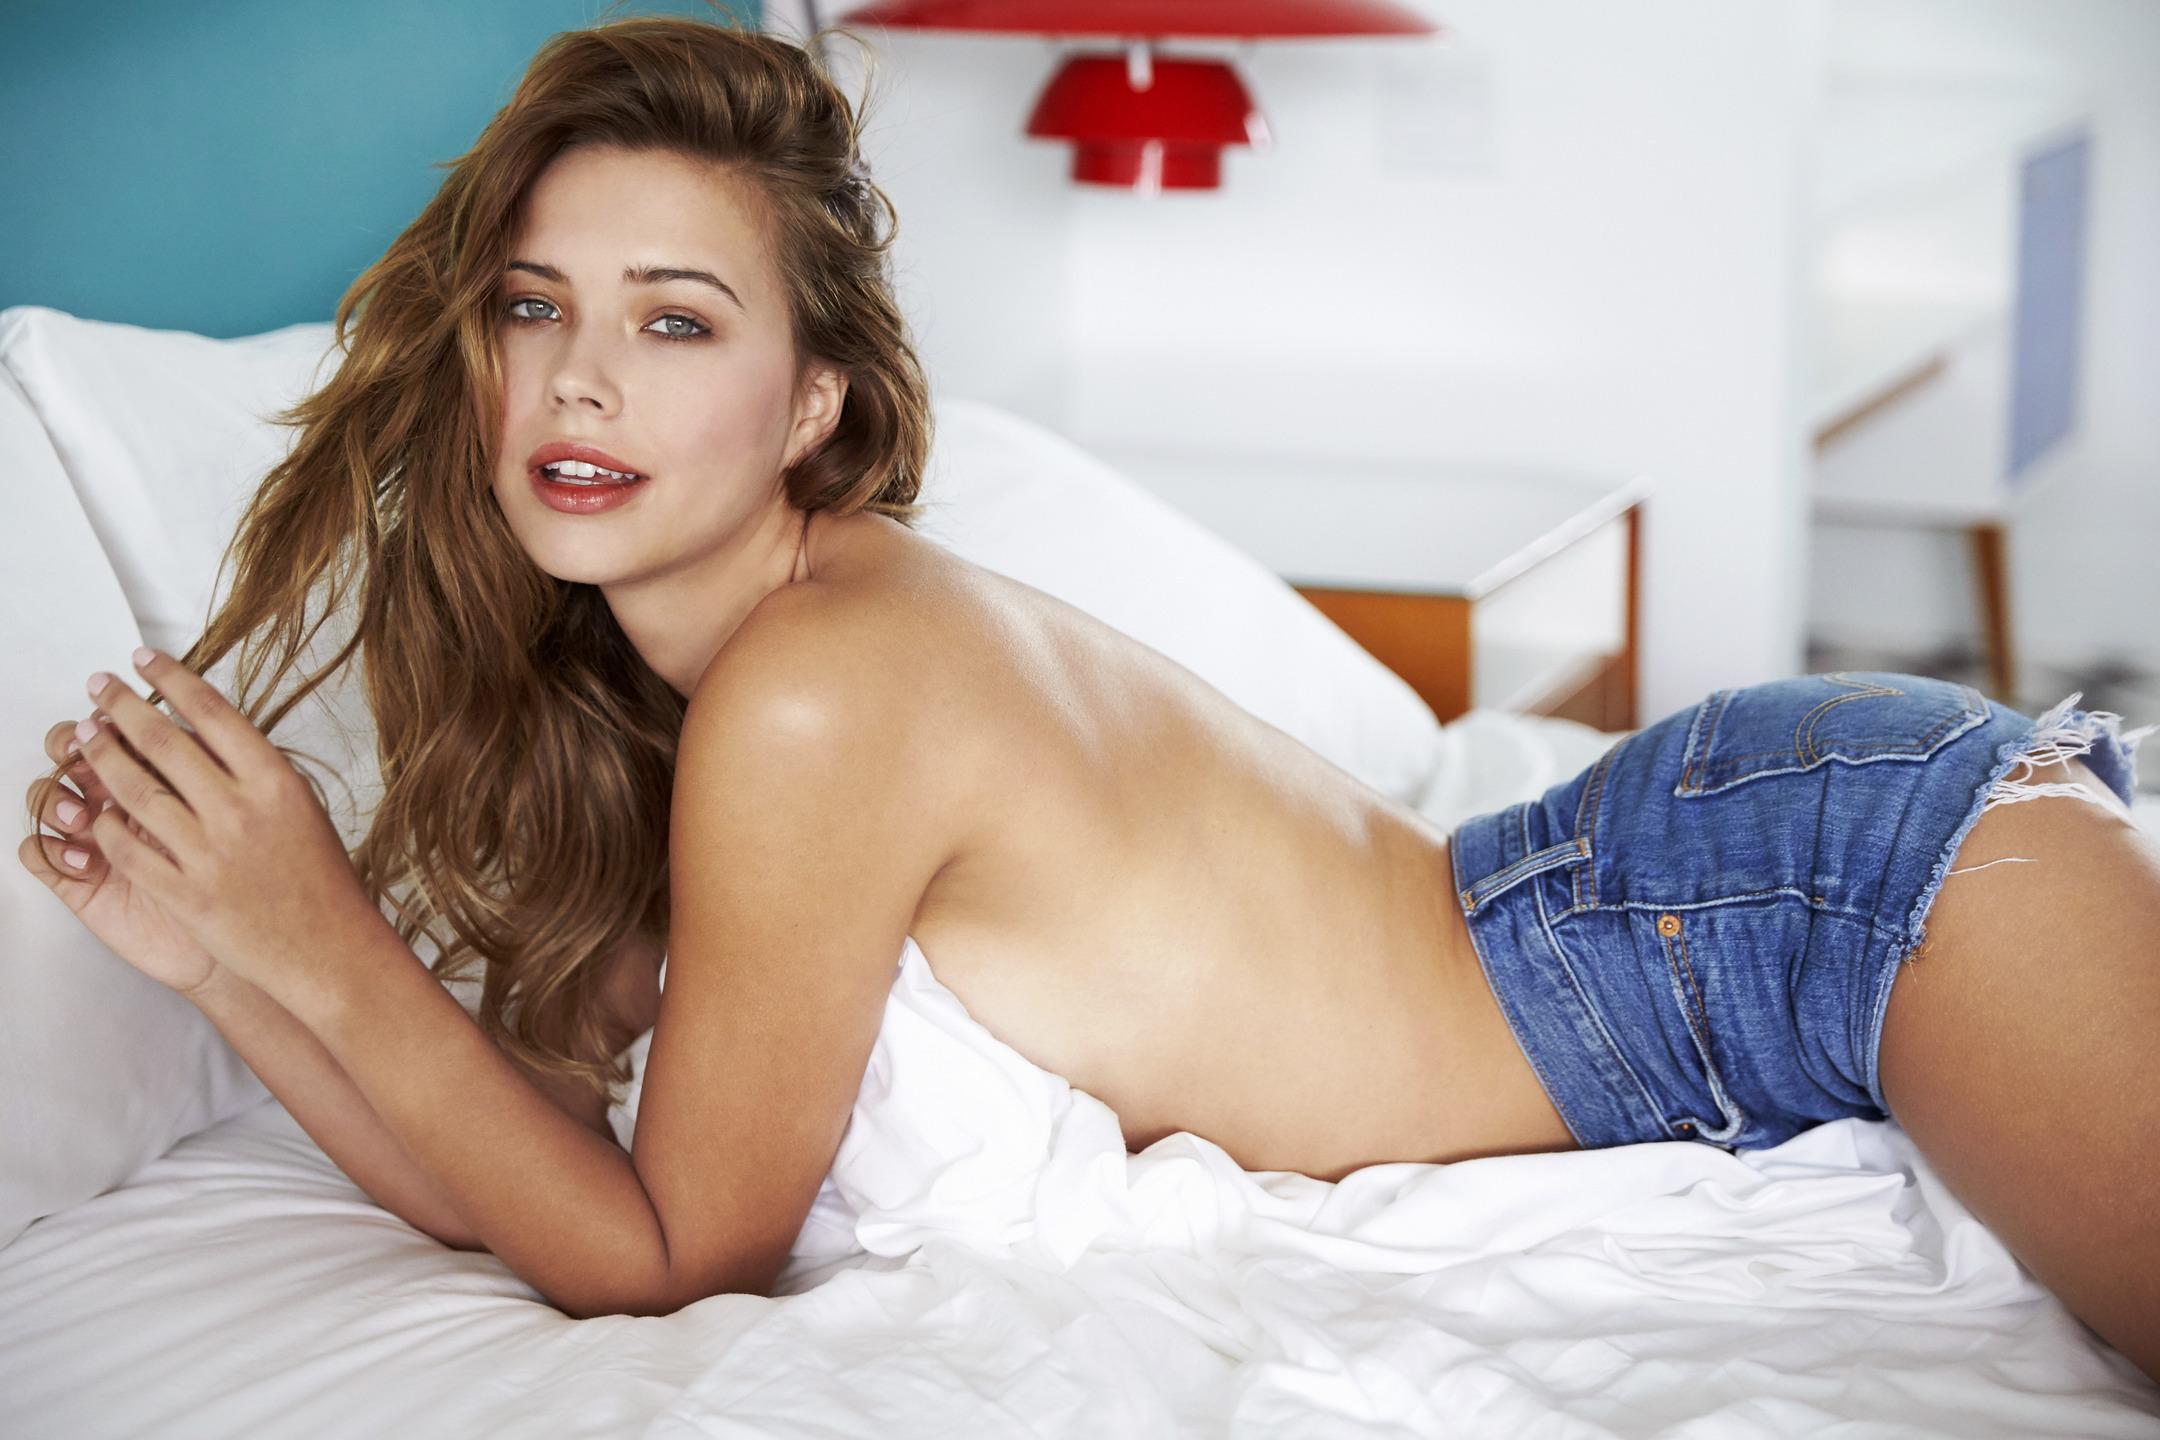 Sandra Kubicka Pictures